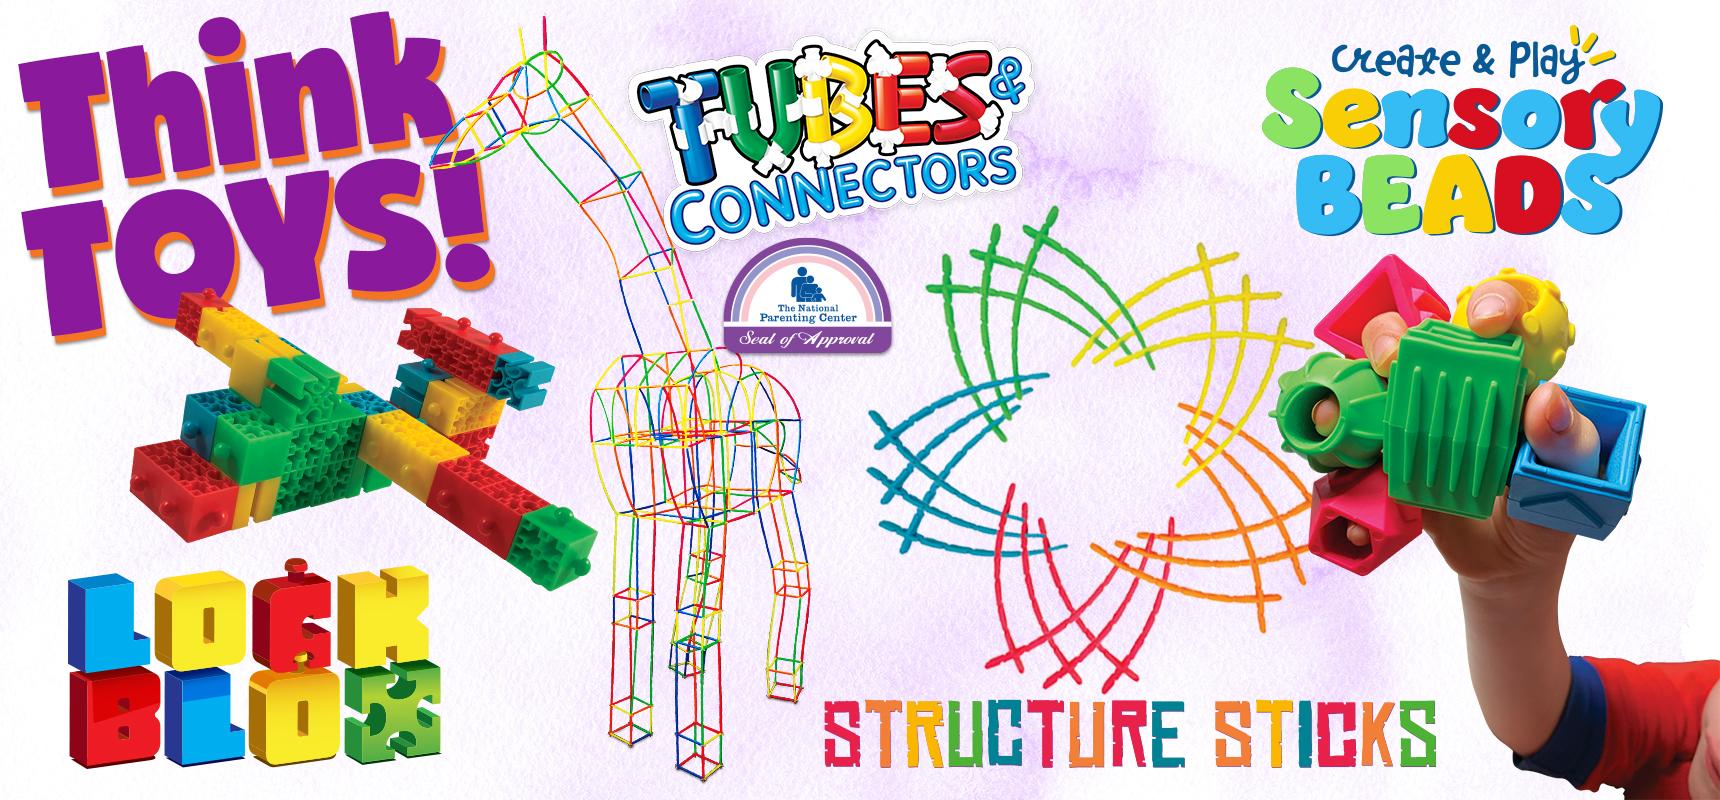 Educational Toy Company